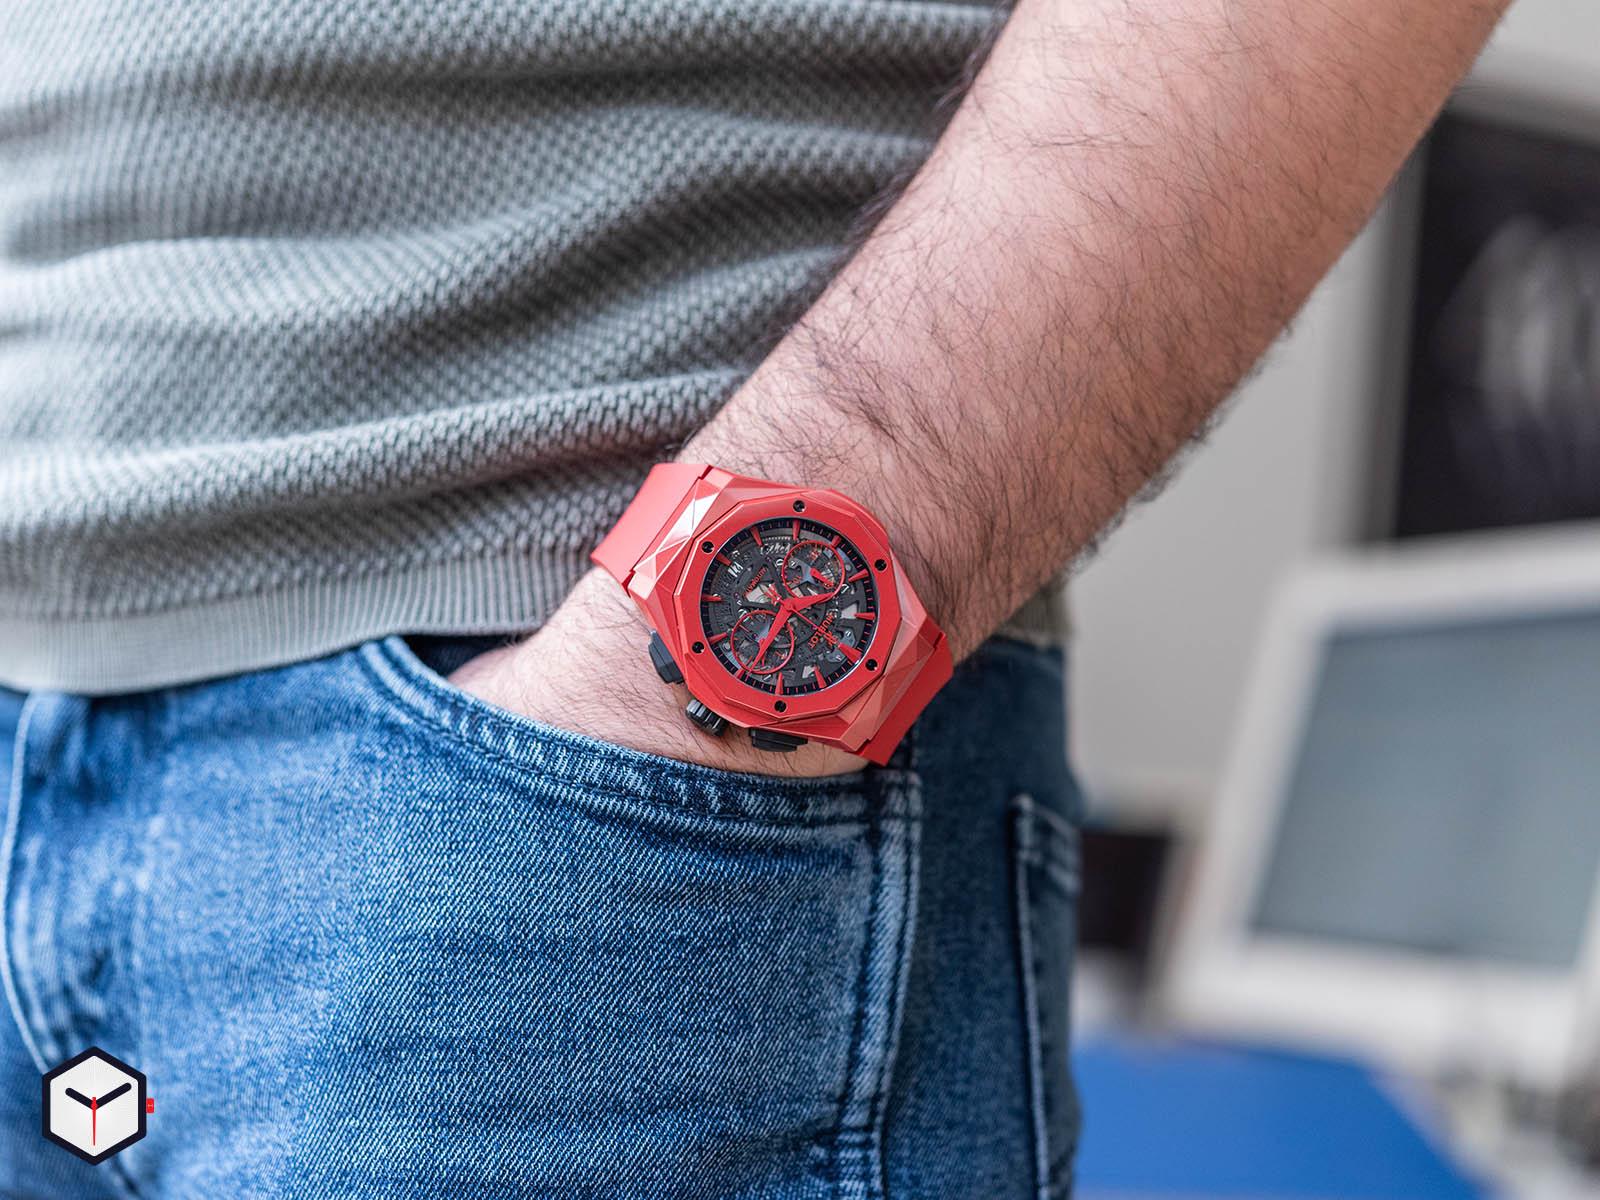 525-cf-0130-rx-orl19-hublot-classic-fusion-chronograph-orlinski-red-ceramic-9.jpg